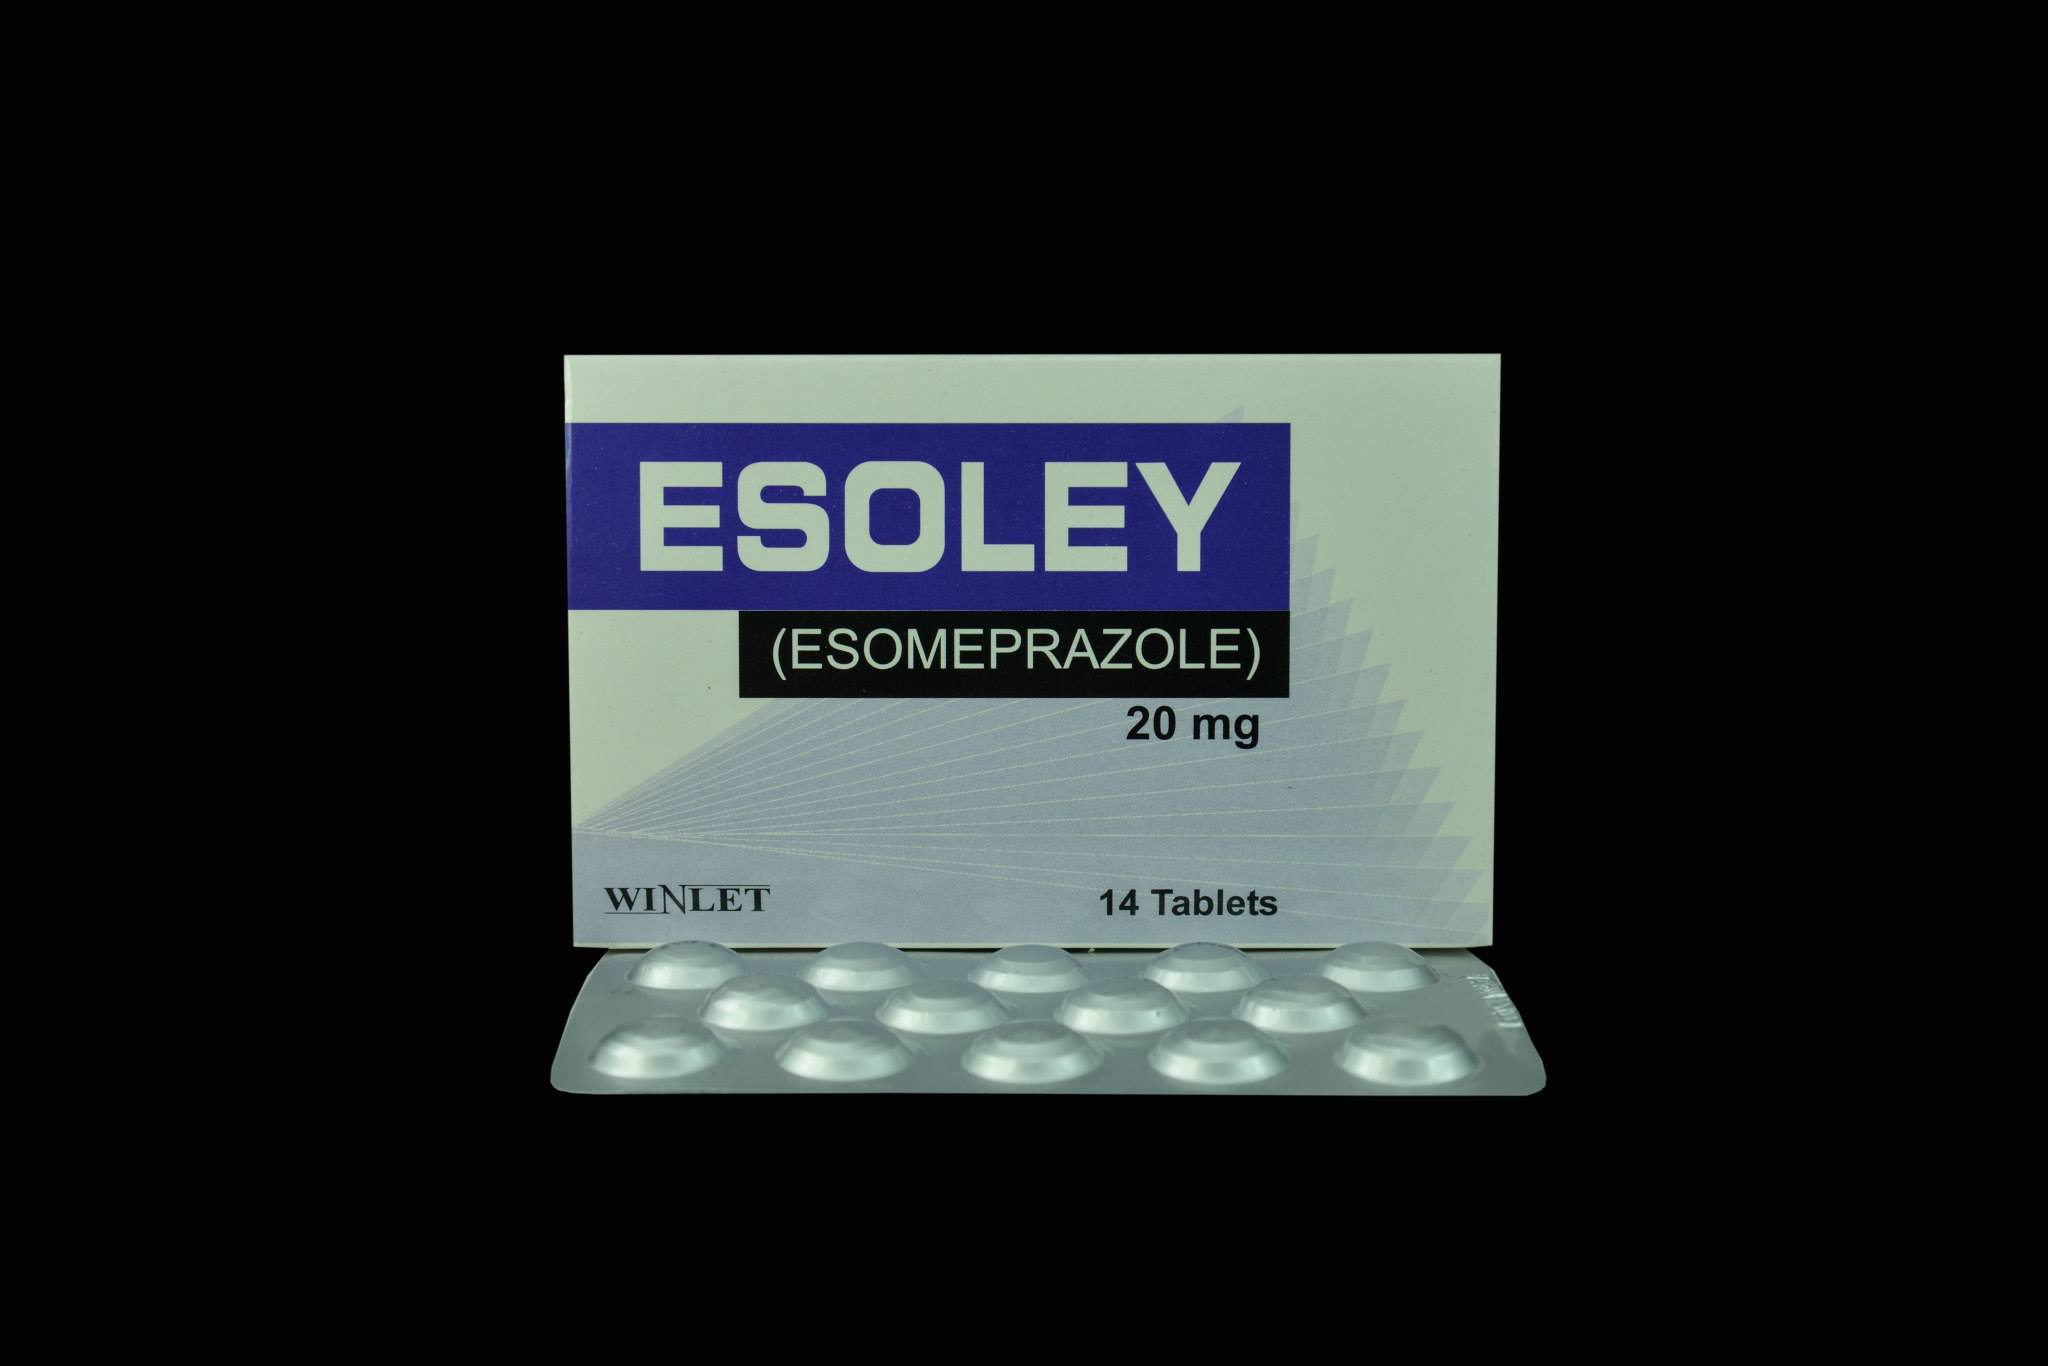 esoley tab 20mg winlet pharmaceuticals